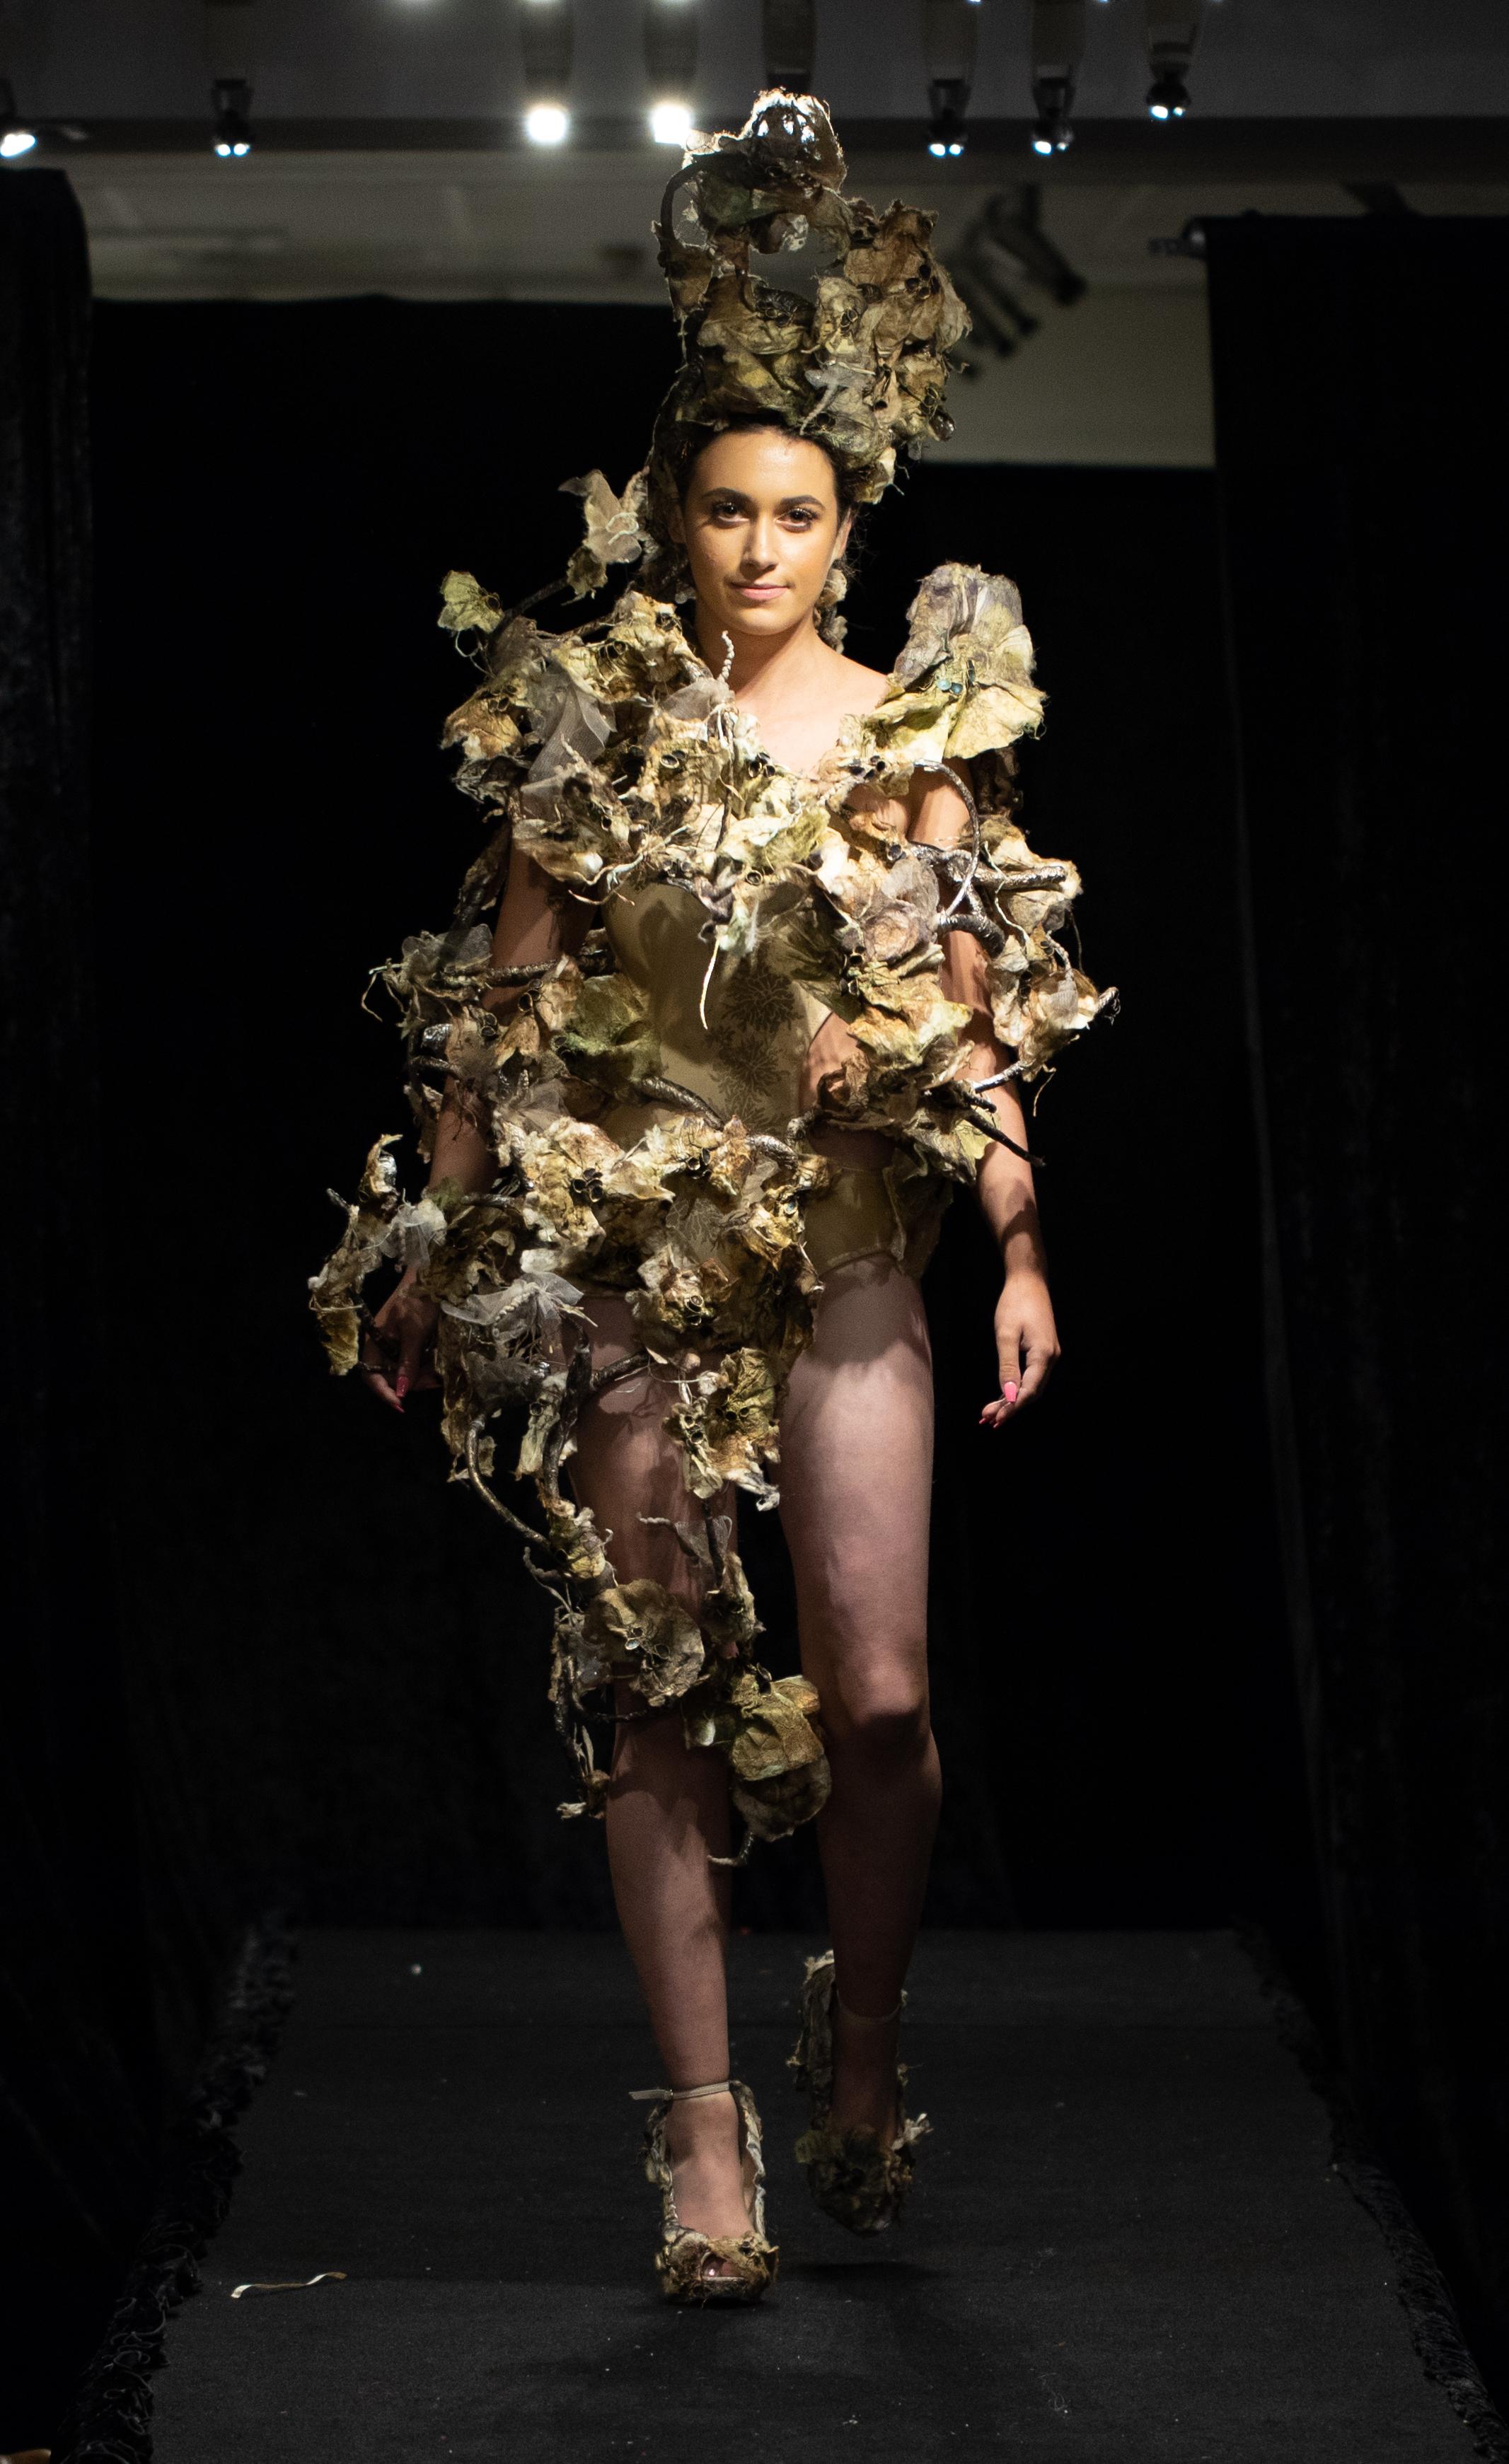 Svenja Lichen Morphology Wire armature, papier-mache, silk paper, silk cocoon stripping, shimmer inks, acrylic paint, crochet cotton, paper string Photo: Grant Wells